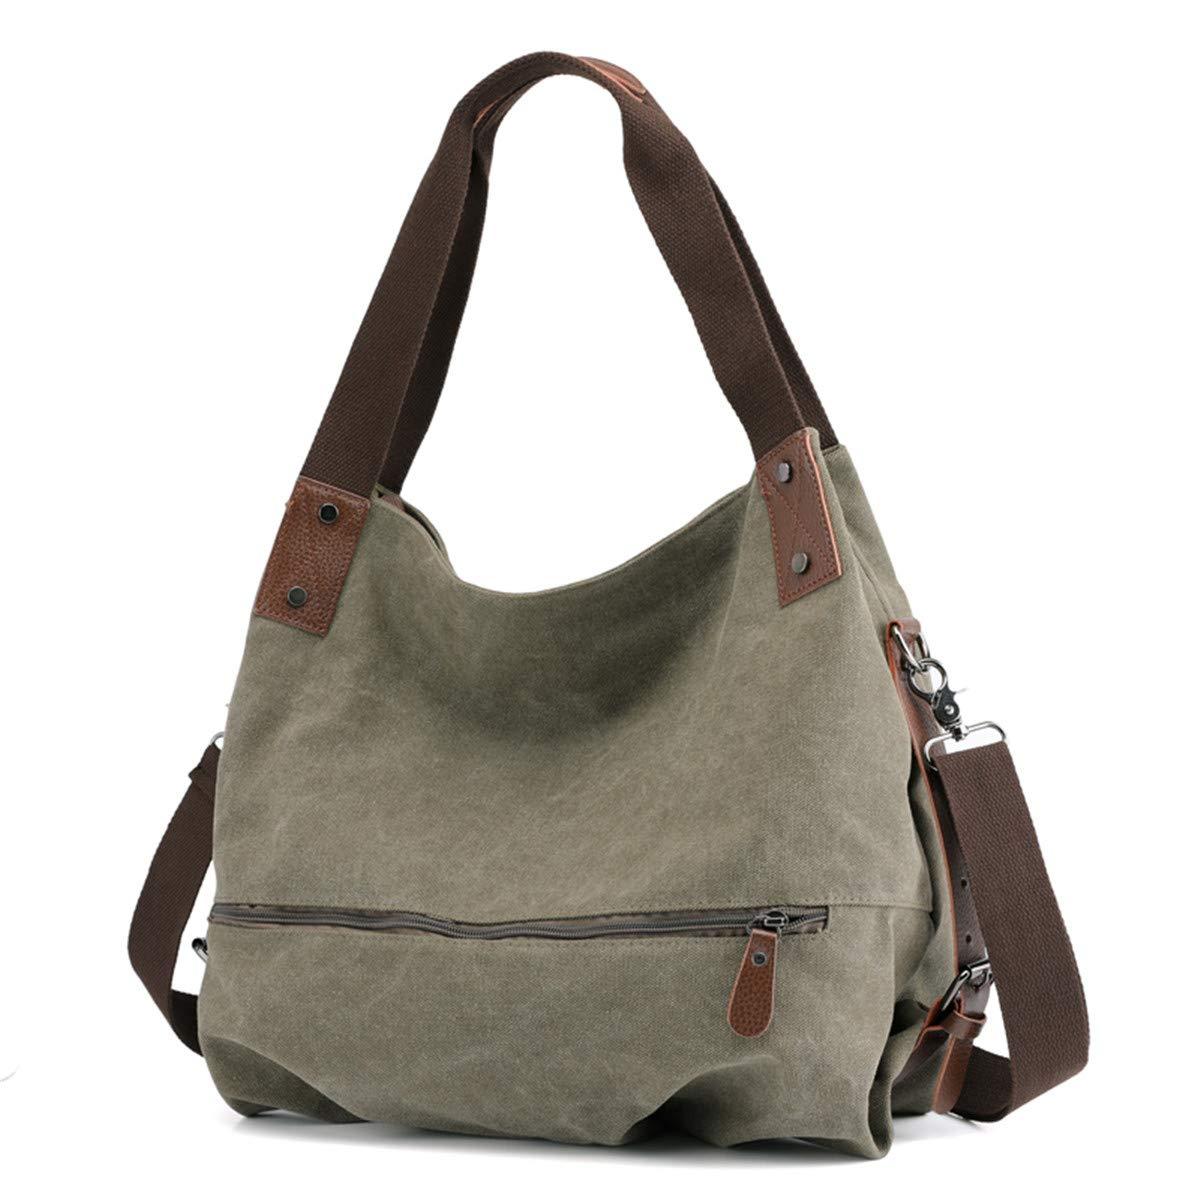 SJMMBB Women's Bag, Canvas Bag, Satchel, Fashion Satchel Satchel Bag,Green,31X40X17Cm